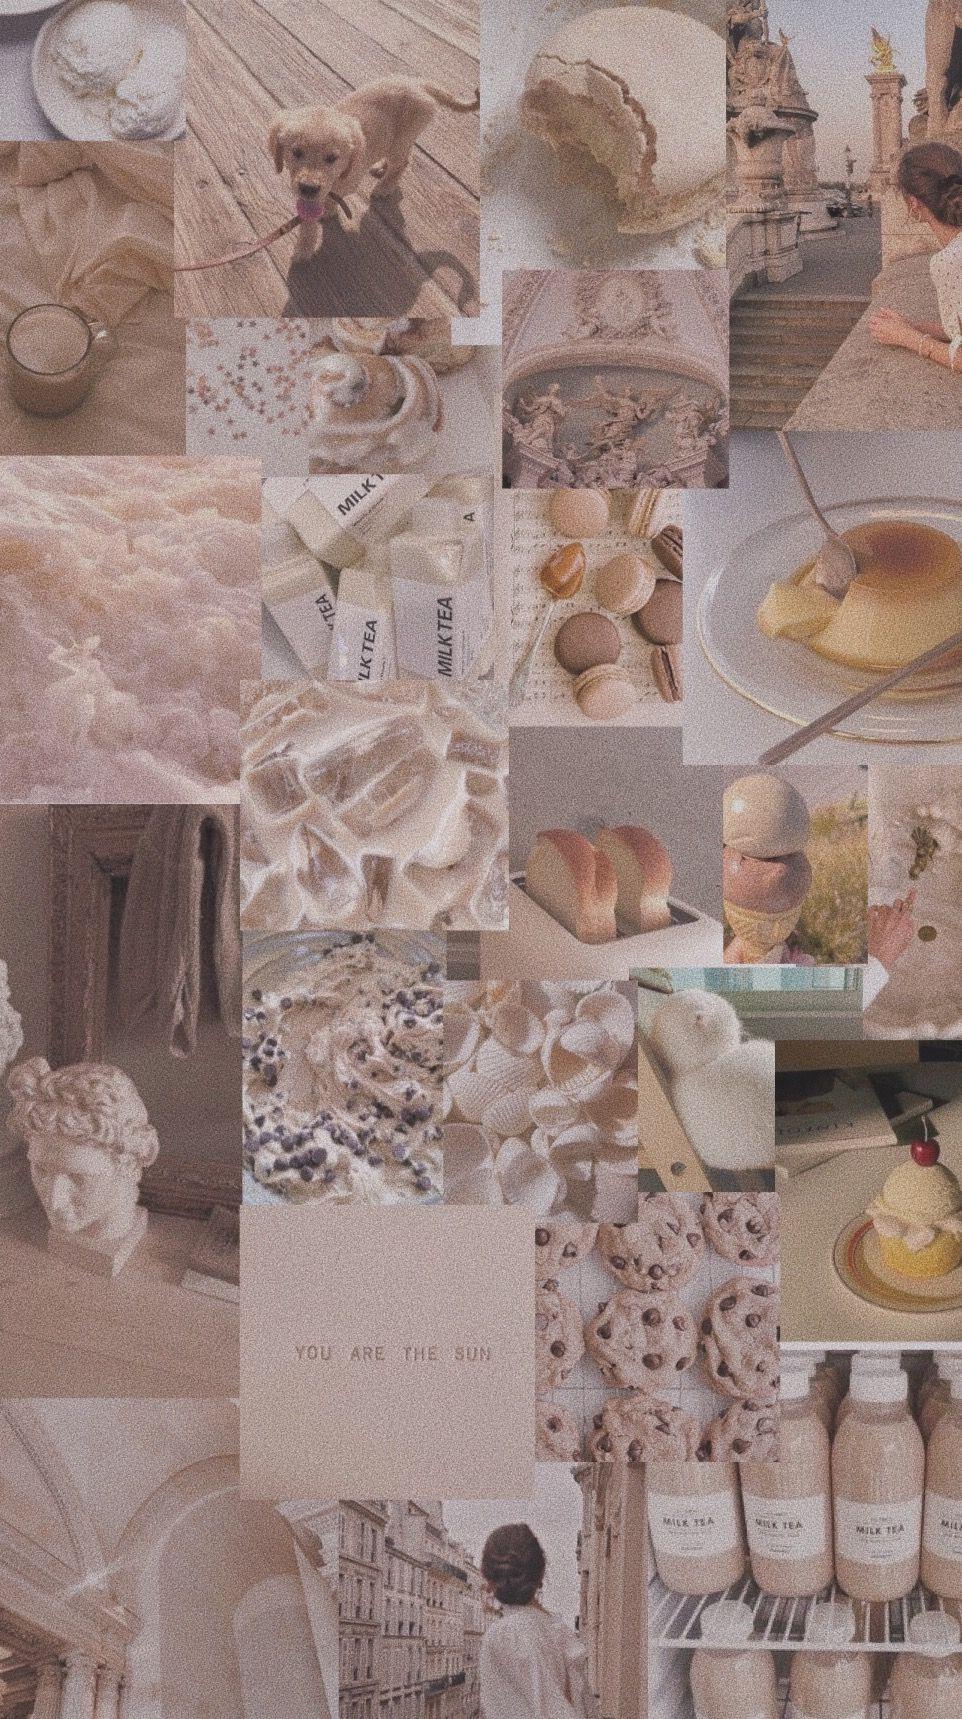 Cream Aesthetic Wallpaper Aesthetic Wallpapers Aesthetic Pastel Wallpaper Cream Aesthetic